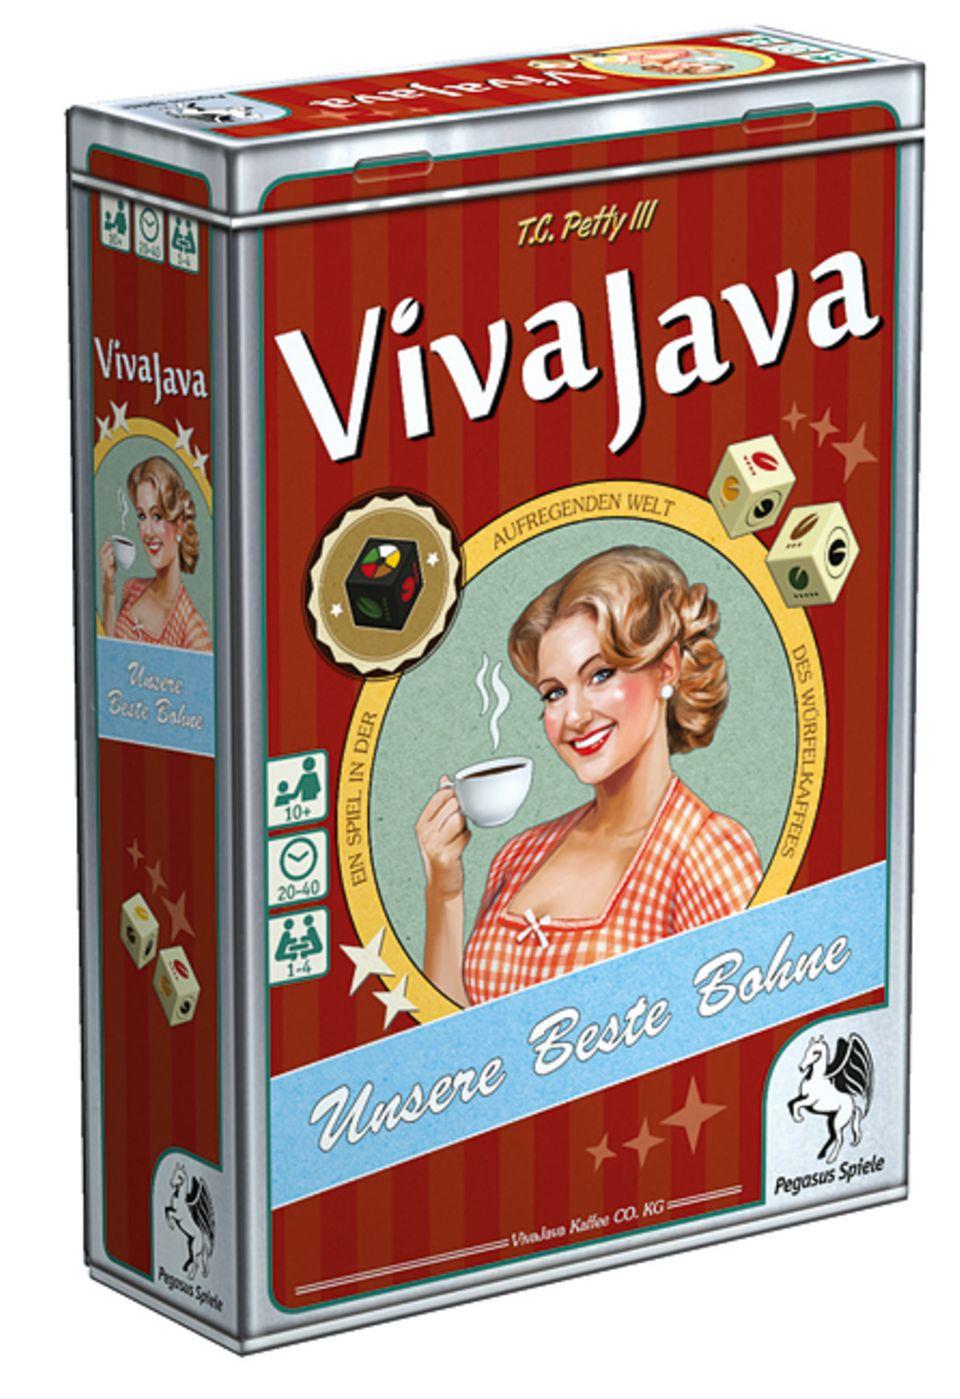 Spieletests: Spieltipp: VivaJava